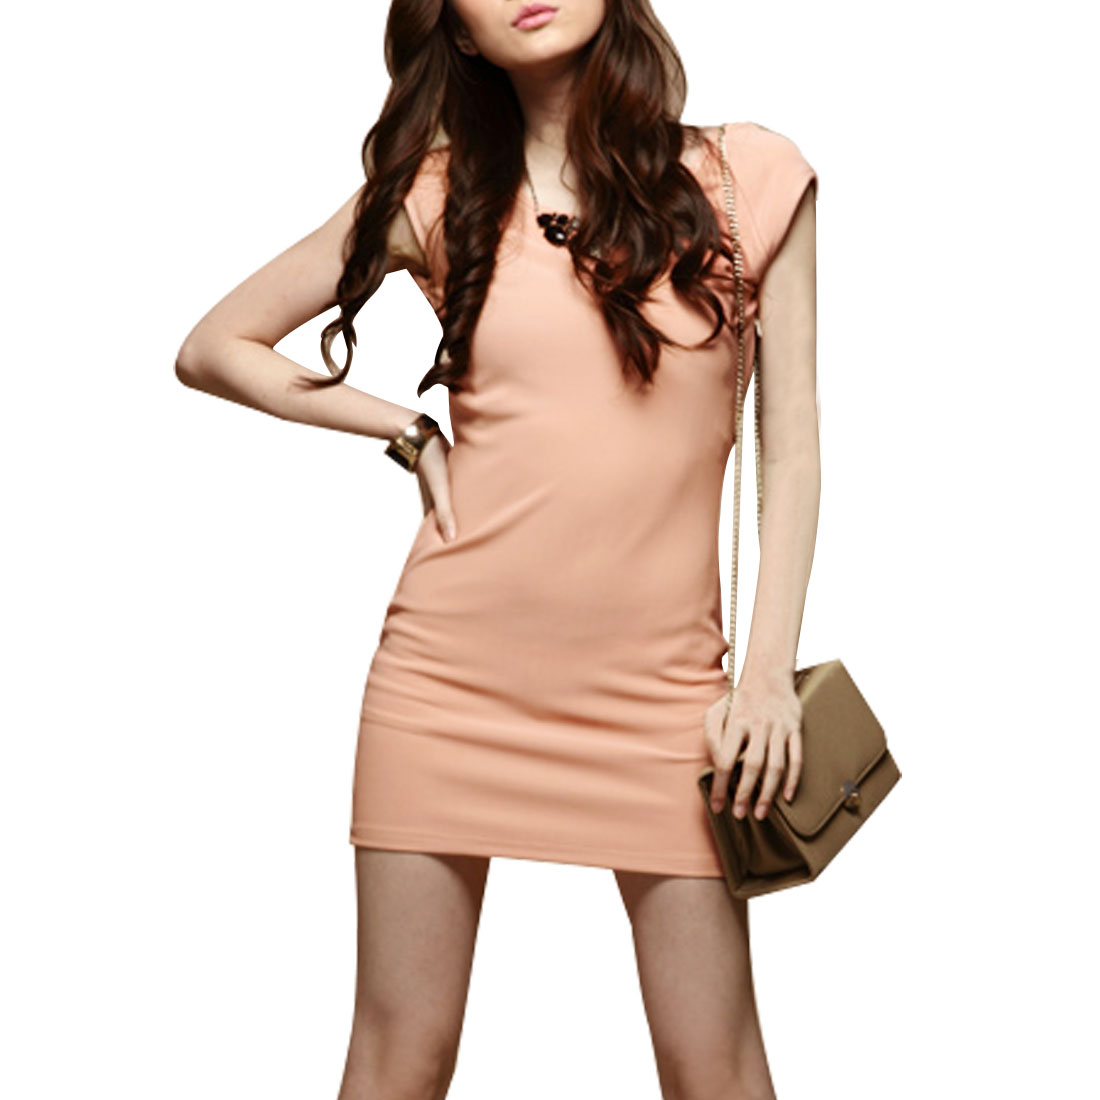 Charming Sheath Waist Hip Hugging Mini Dress Pink XS for Ladies